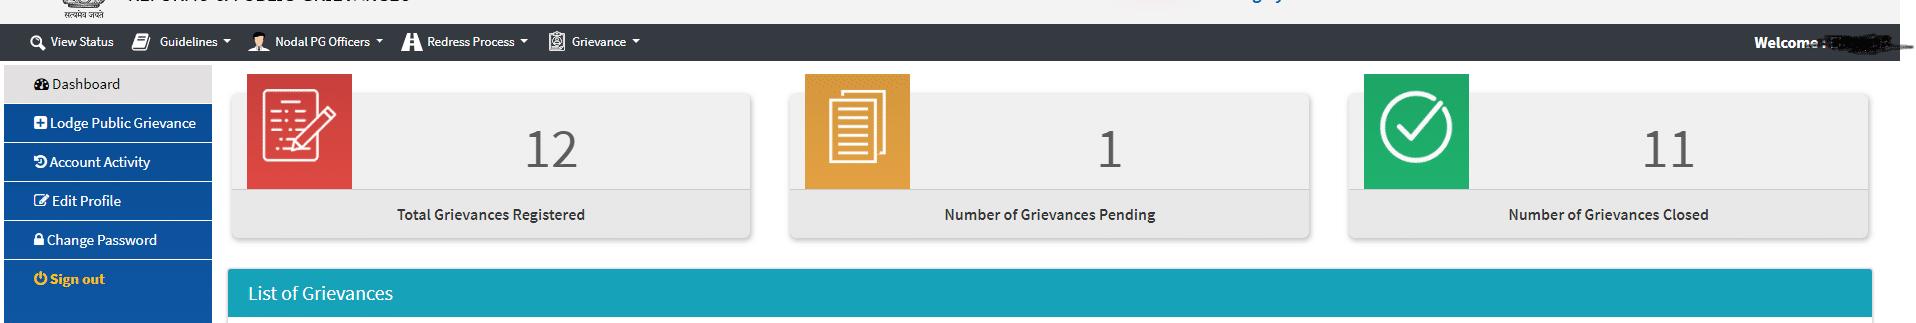 pm complaint portal dashboard